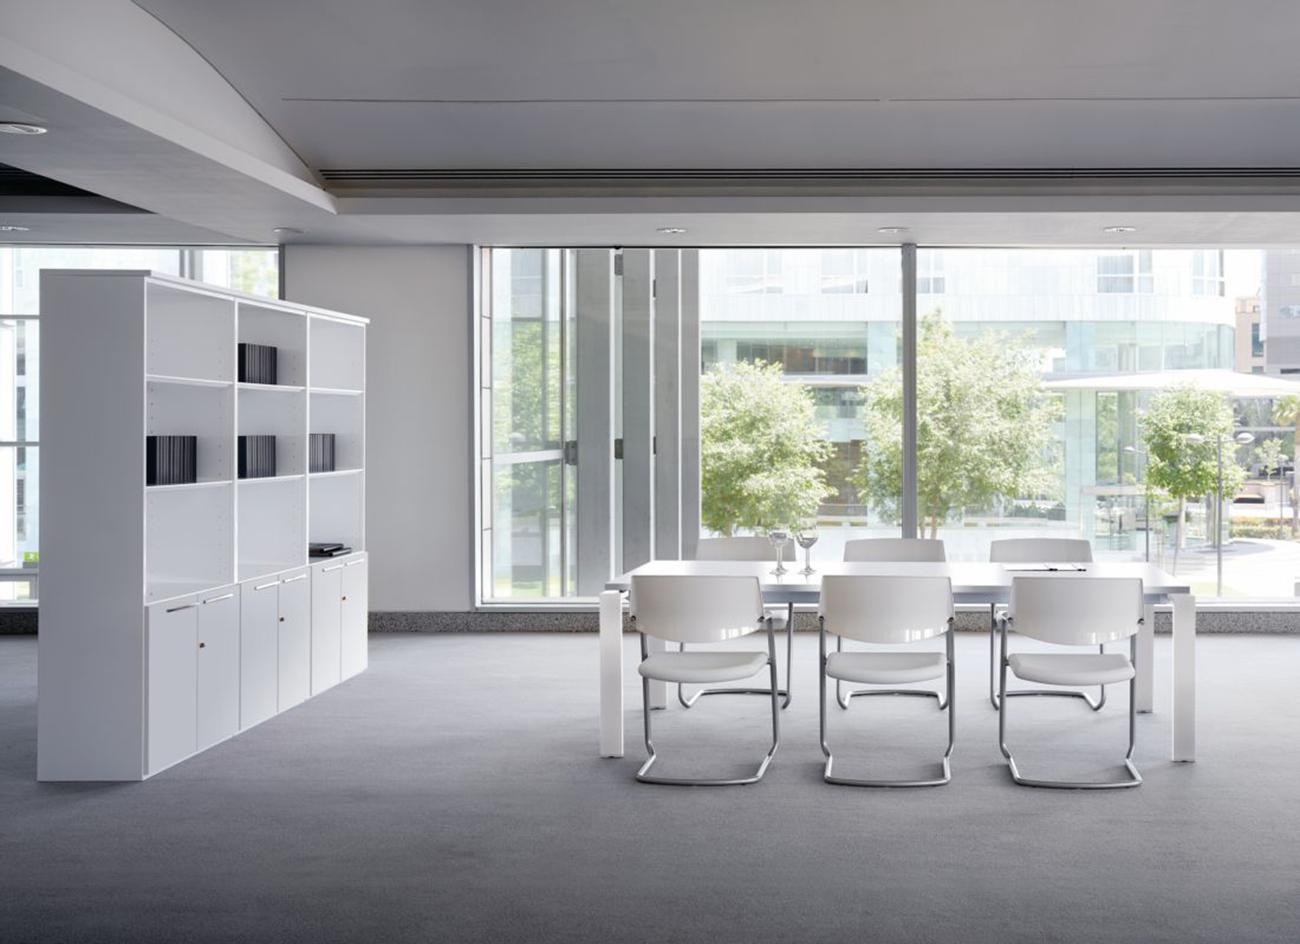 muebles de oficina wizzy obtenga ideas dise o de muebles